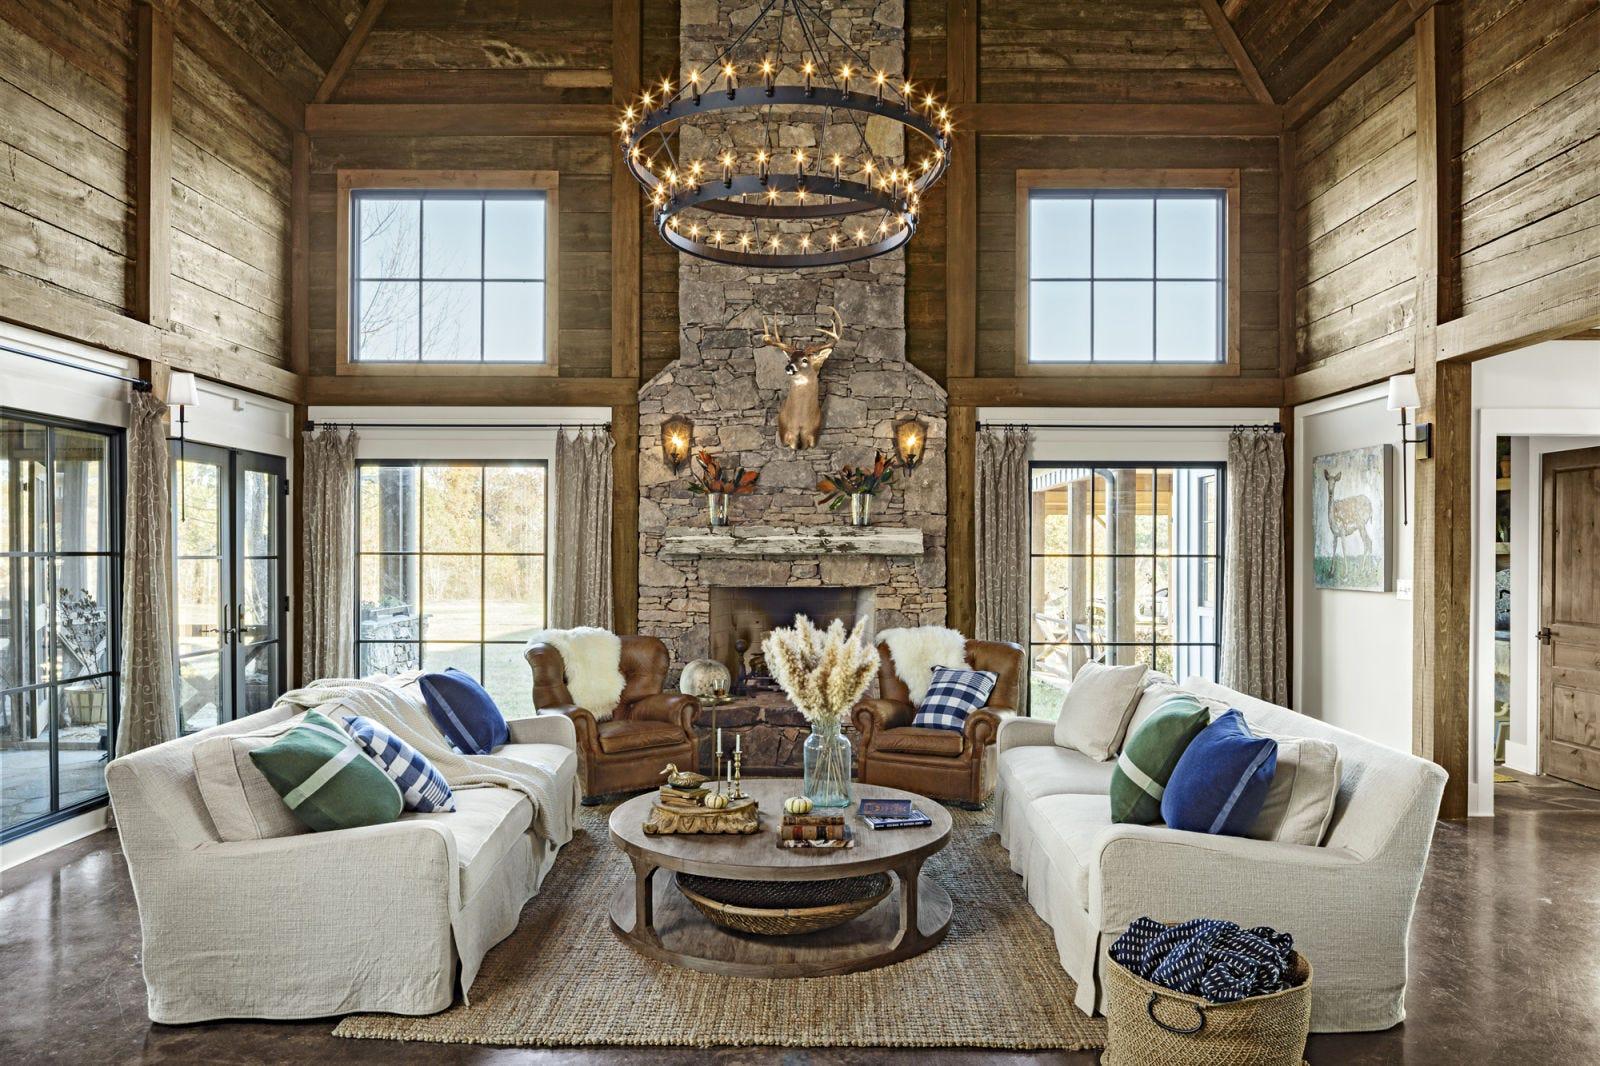 Living room, Room, Interior design, Property, Furniture, Building, Home, Ceiling, House, Estate,